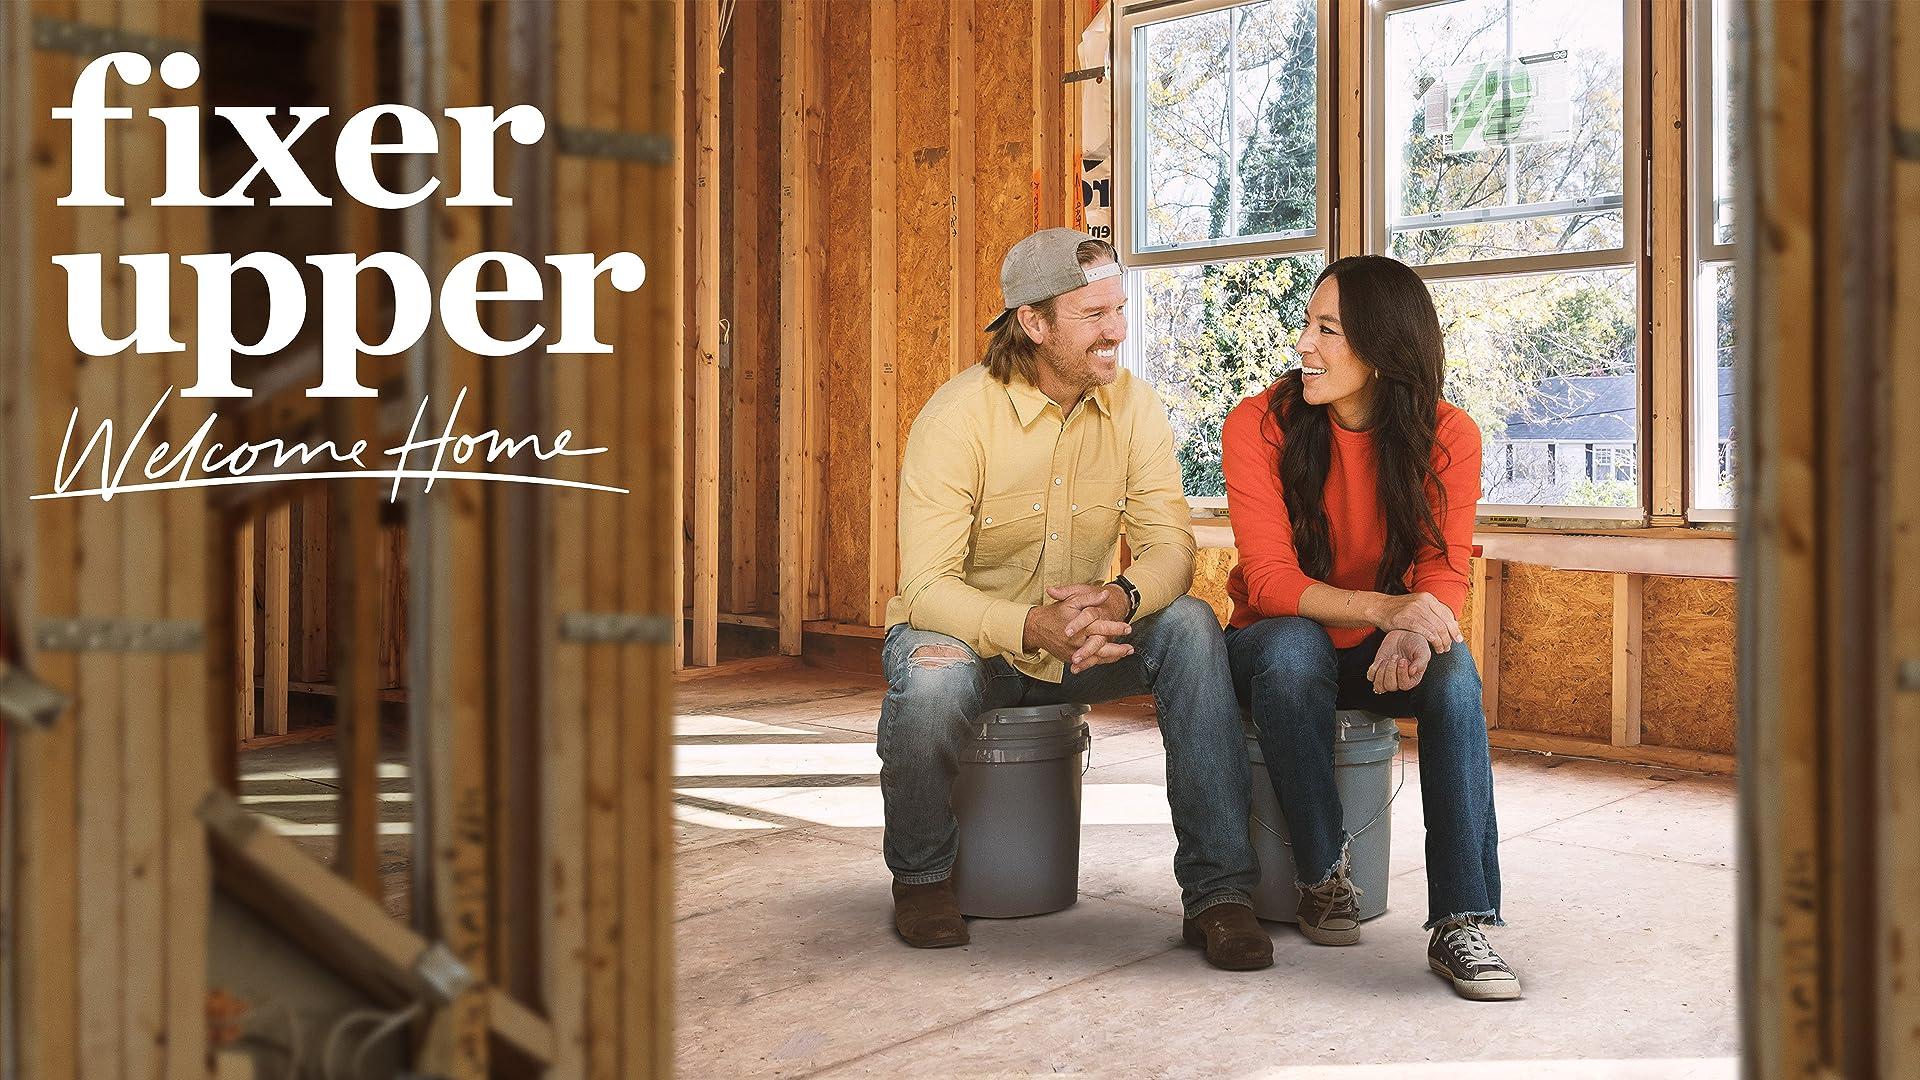 Fixer Upper: Welcome Home - Season 1